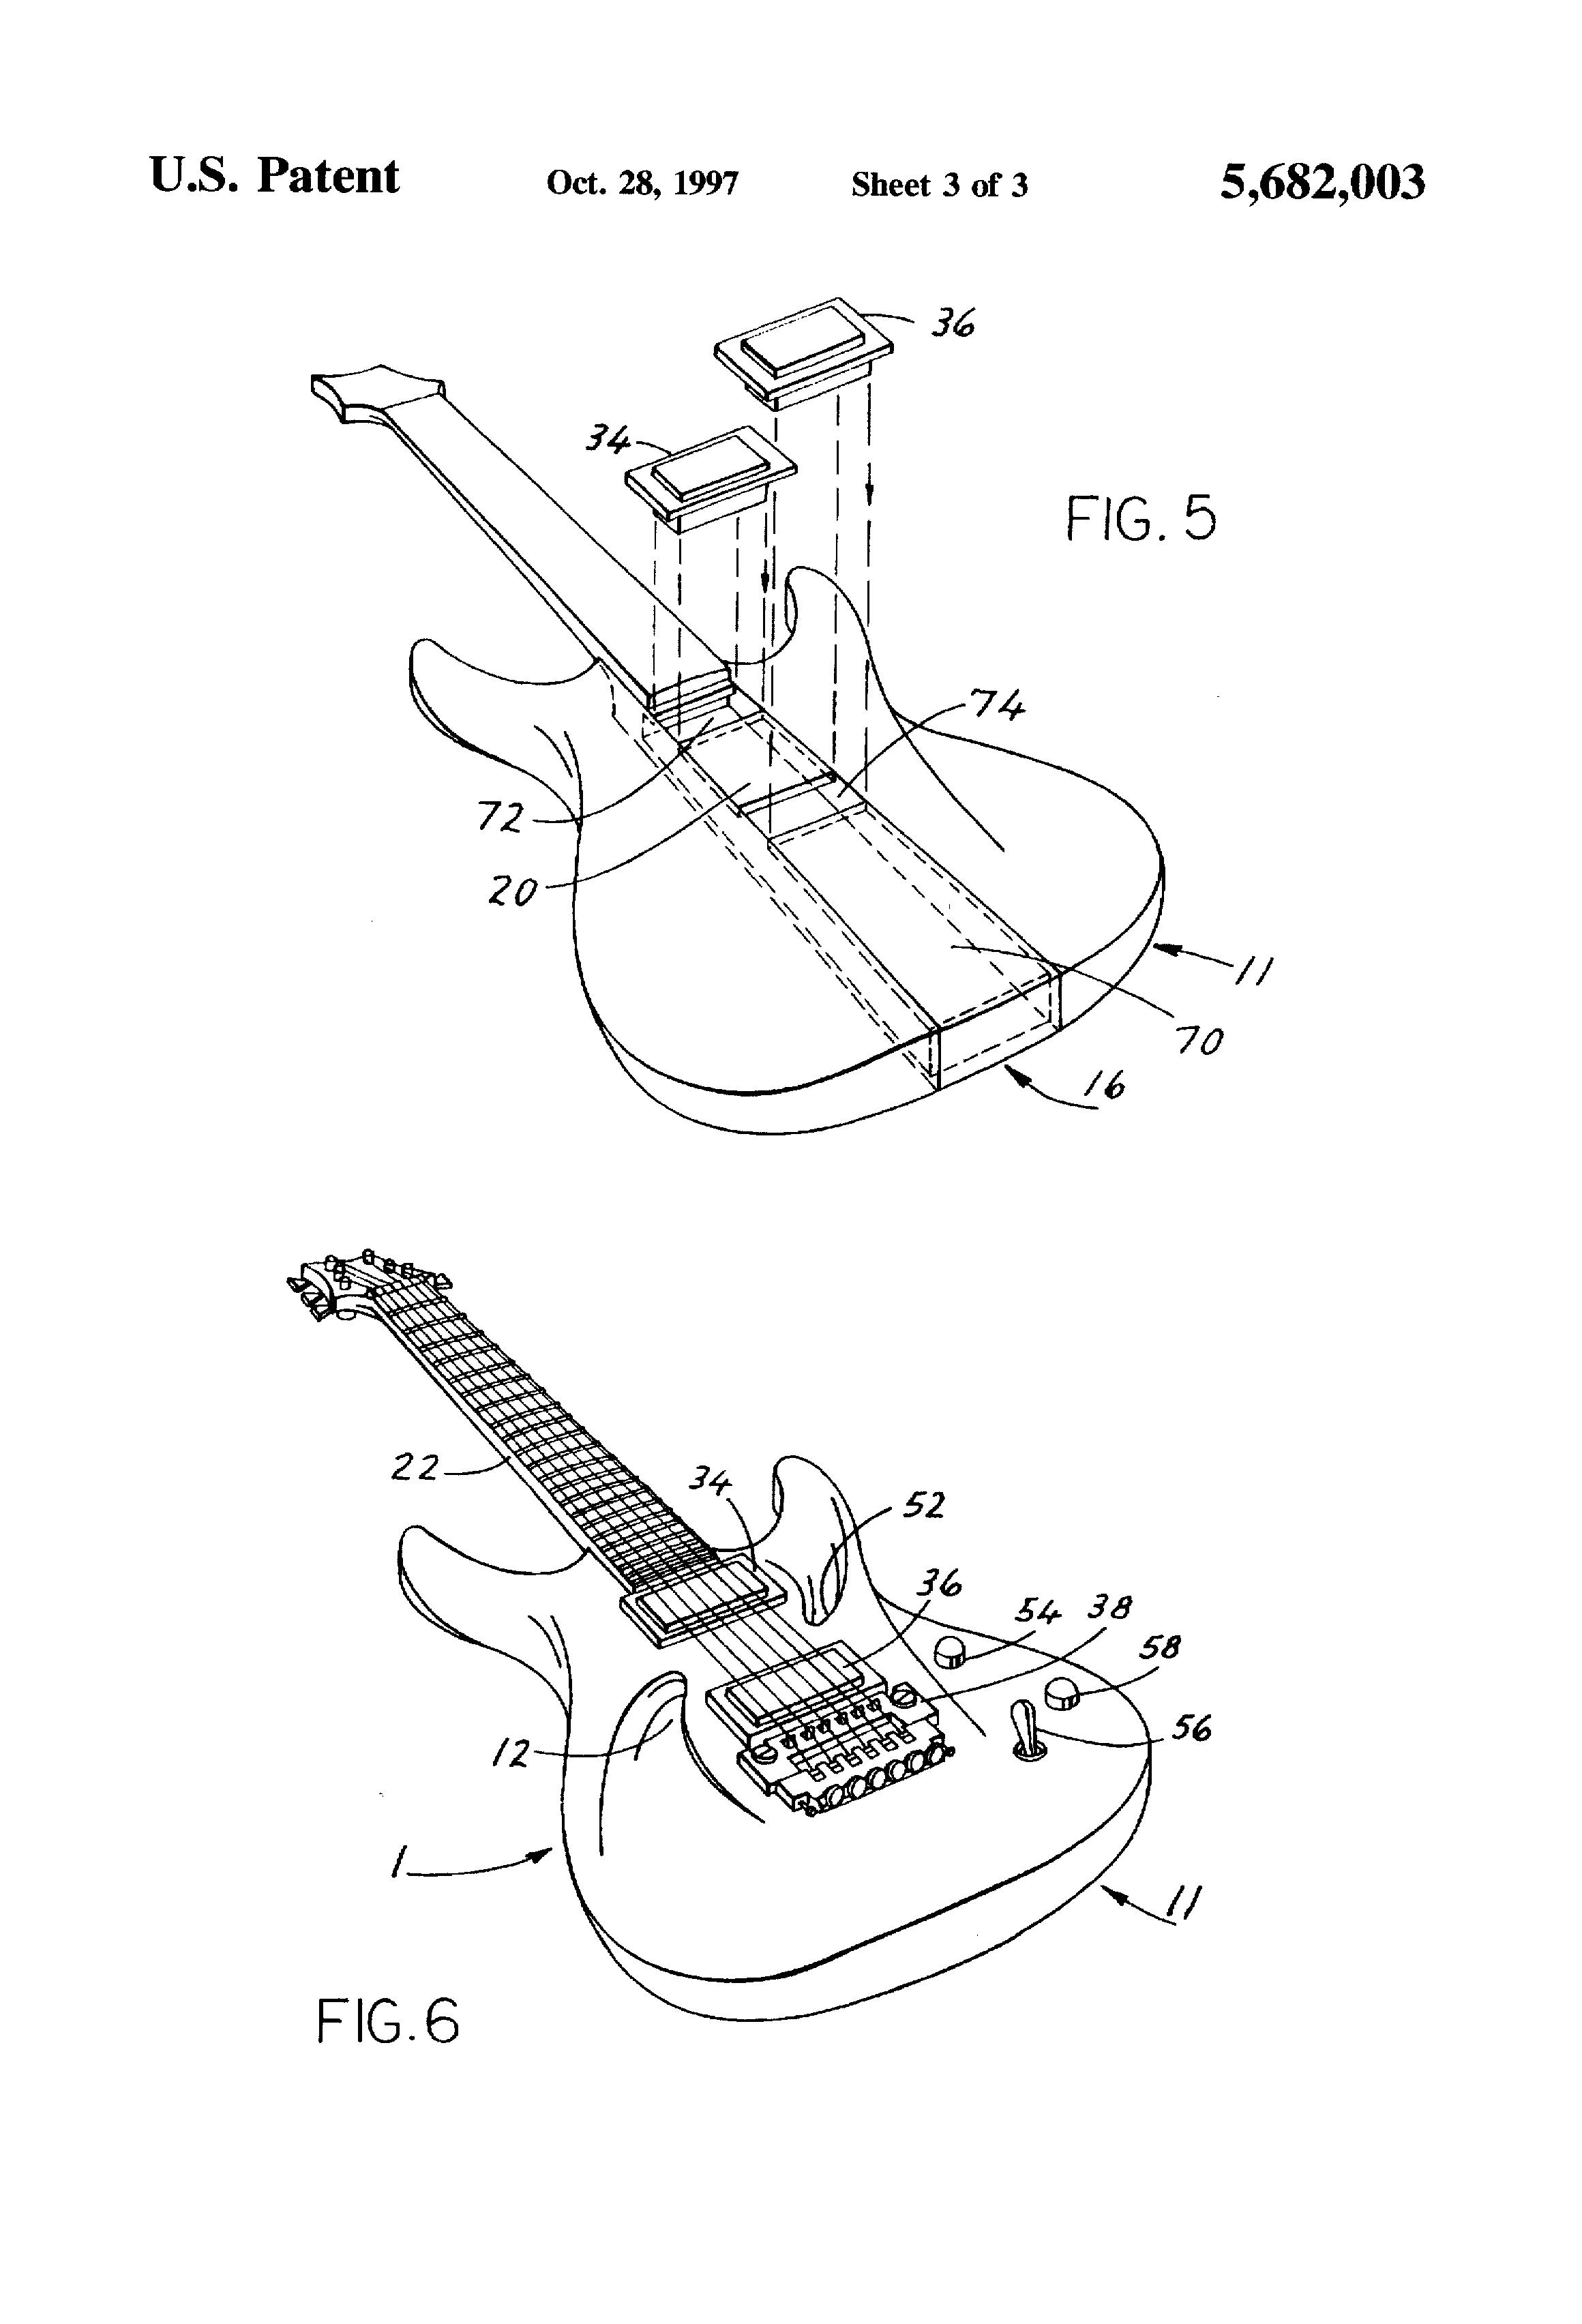 patent us5682003 - semi-acoustic electric guitar